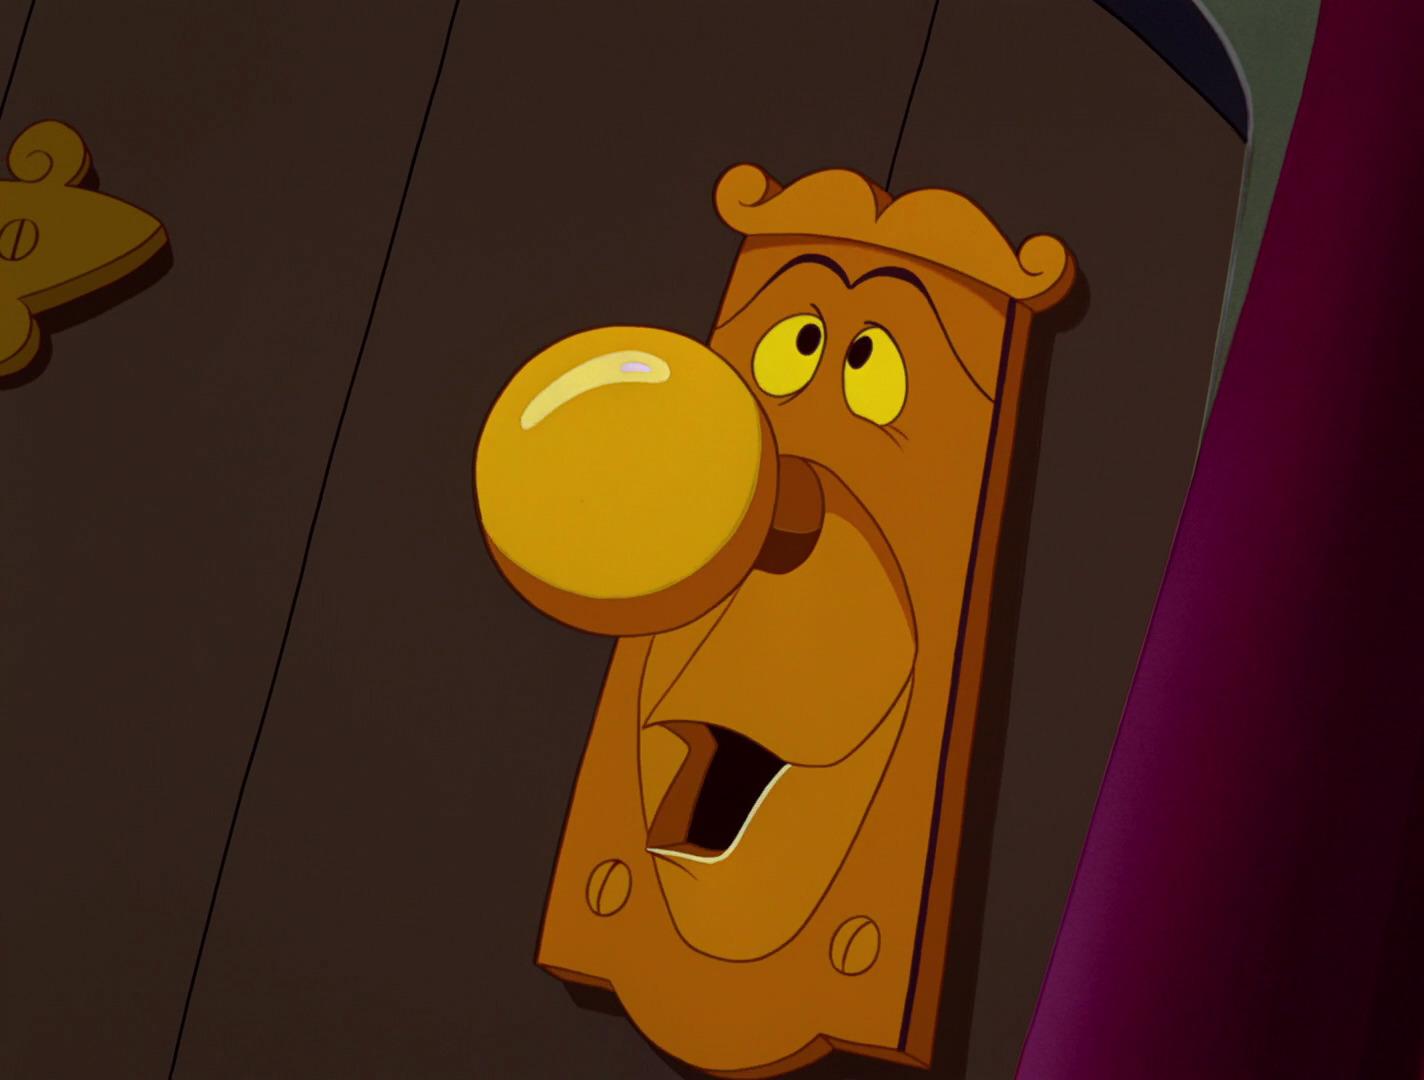 The Doorknob & The Doorknob | Disney Wiki | FANDOM powered by Wikia